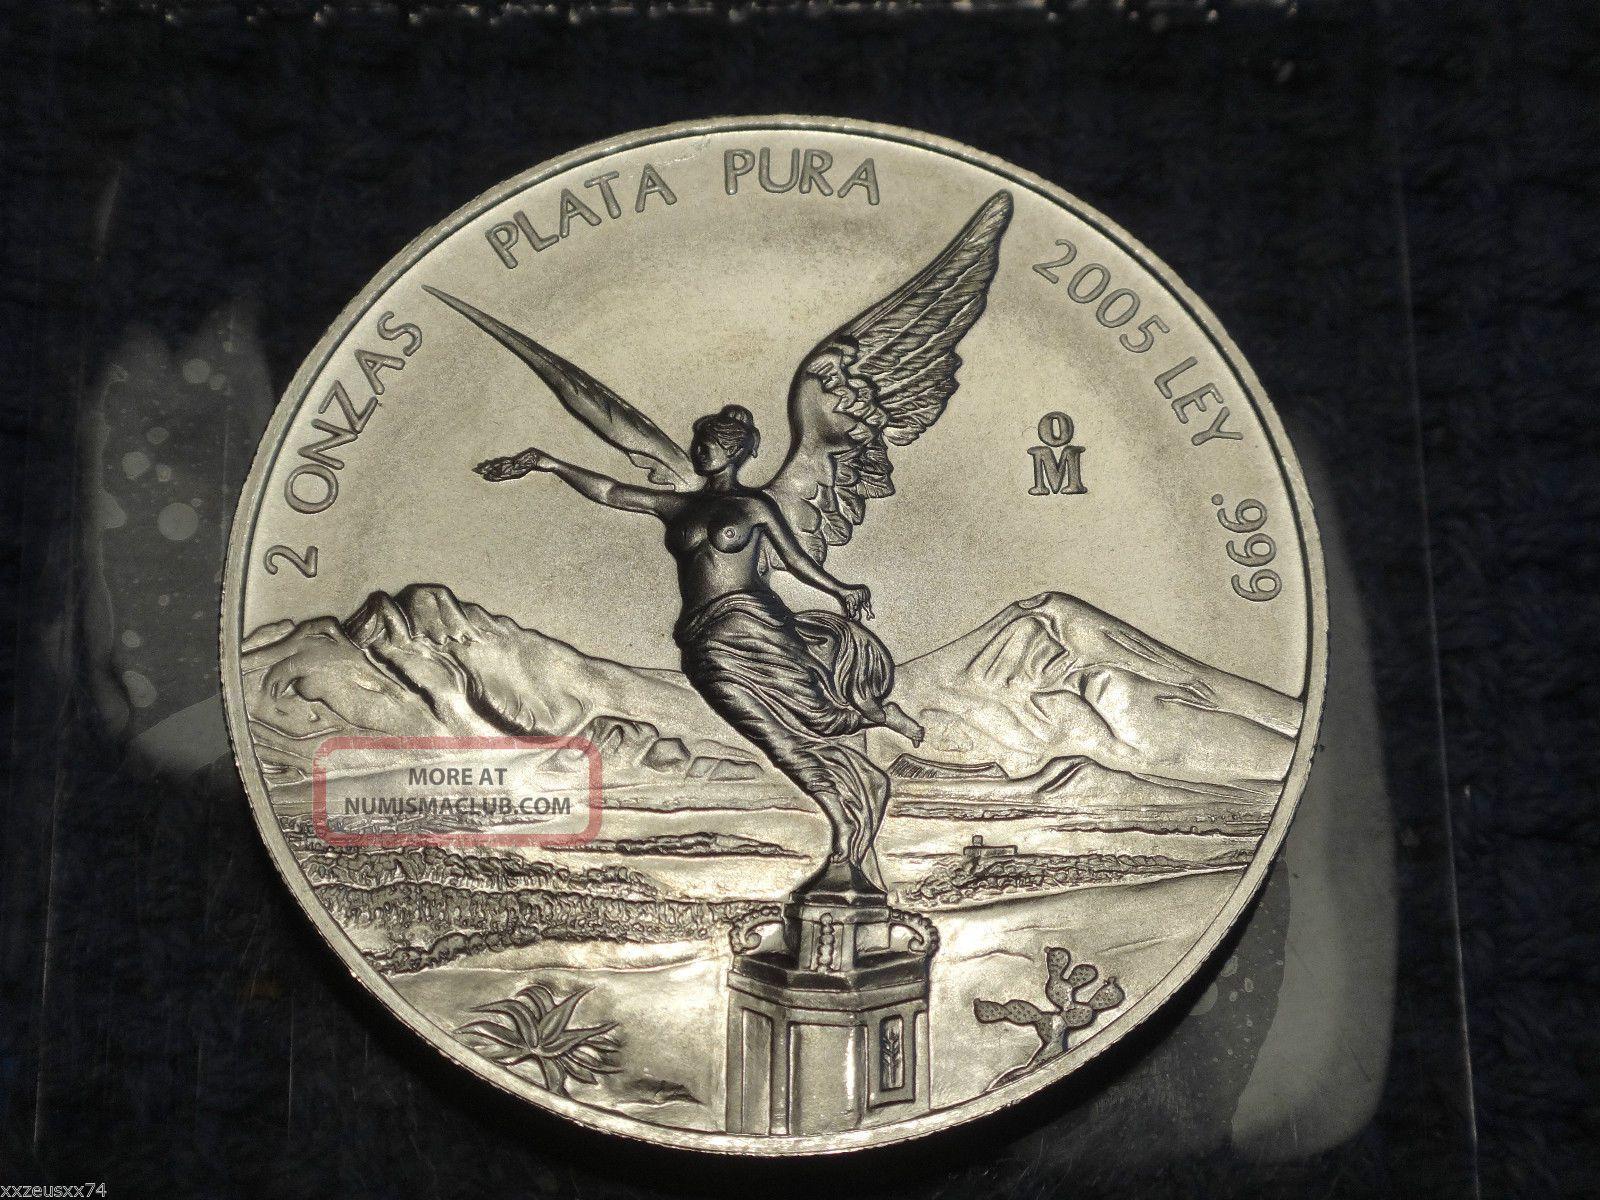 Key Date 2005 Mexico Silver 2 Onzas Libertad Coin